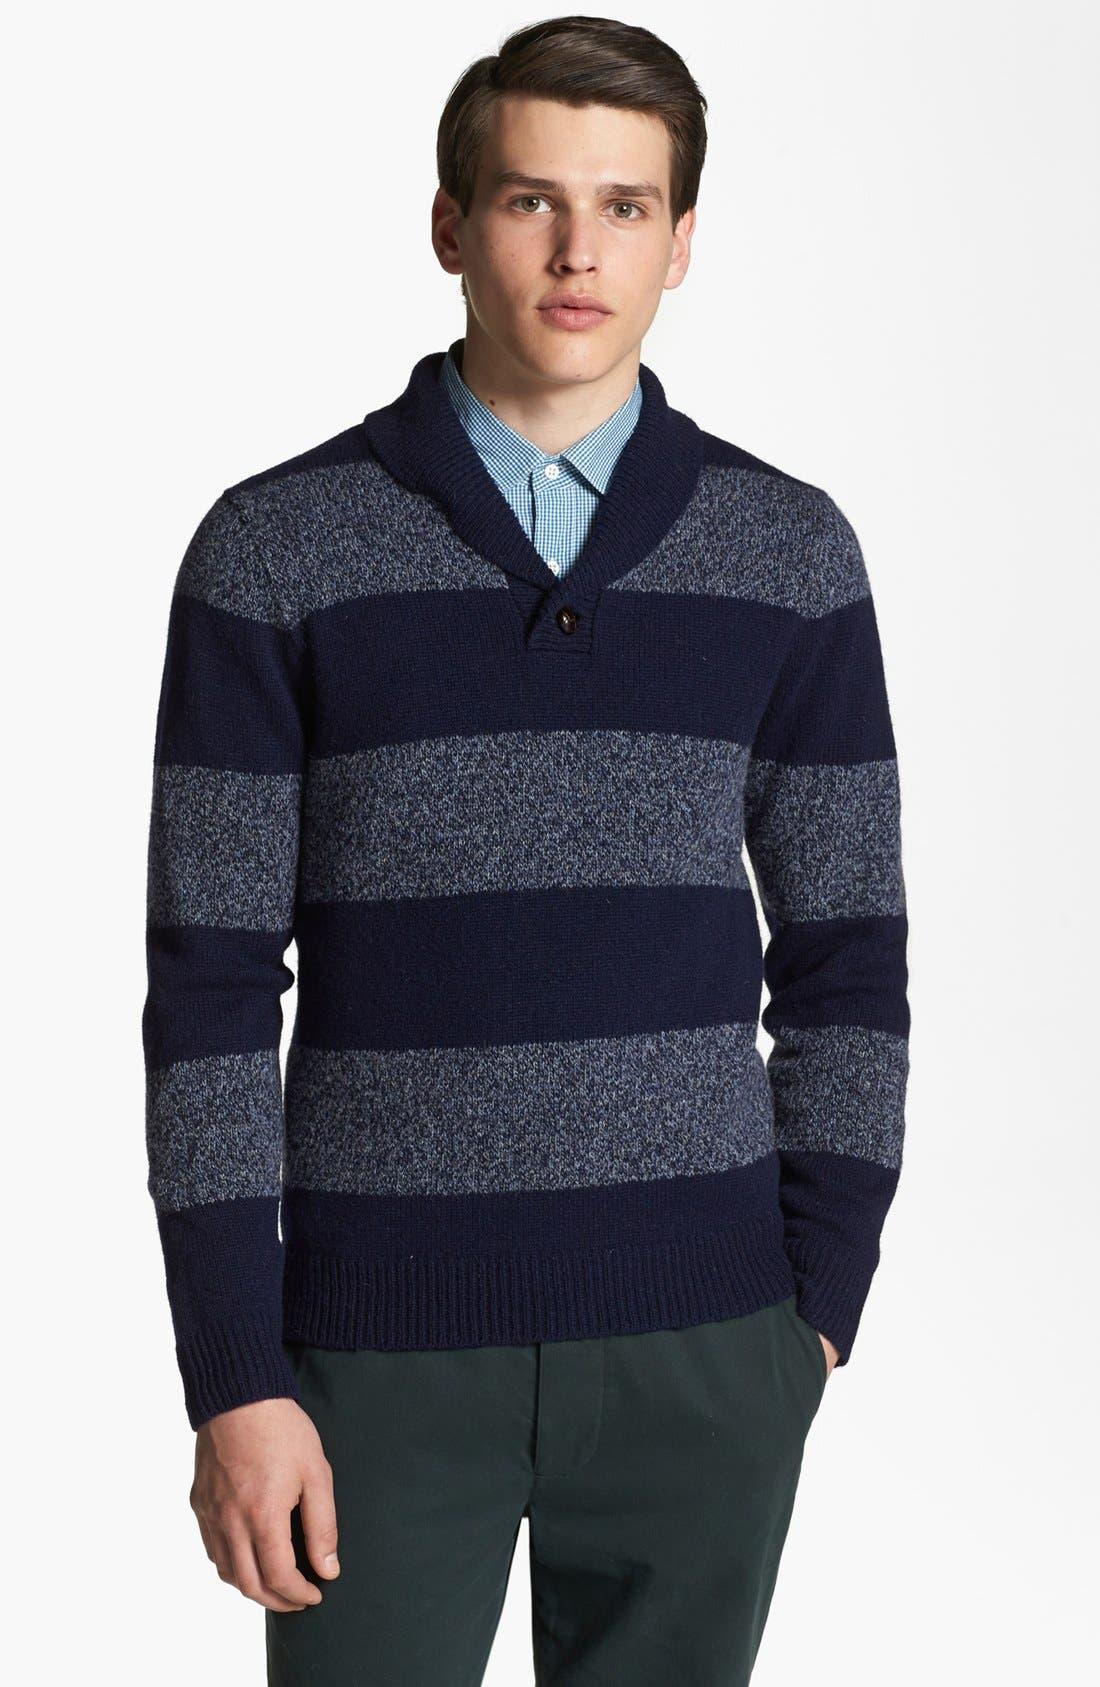 SHIPLEY & HALMOS 'Earnest' Stripe Wool Shawl Collar Sweater, Main, color, 415